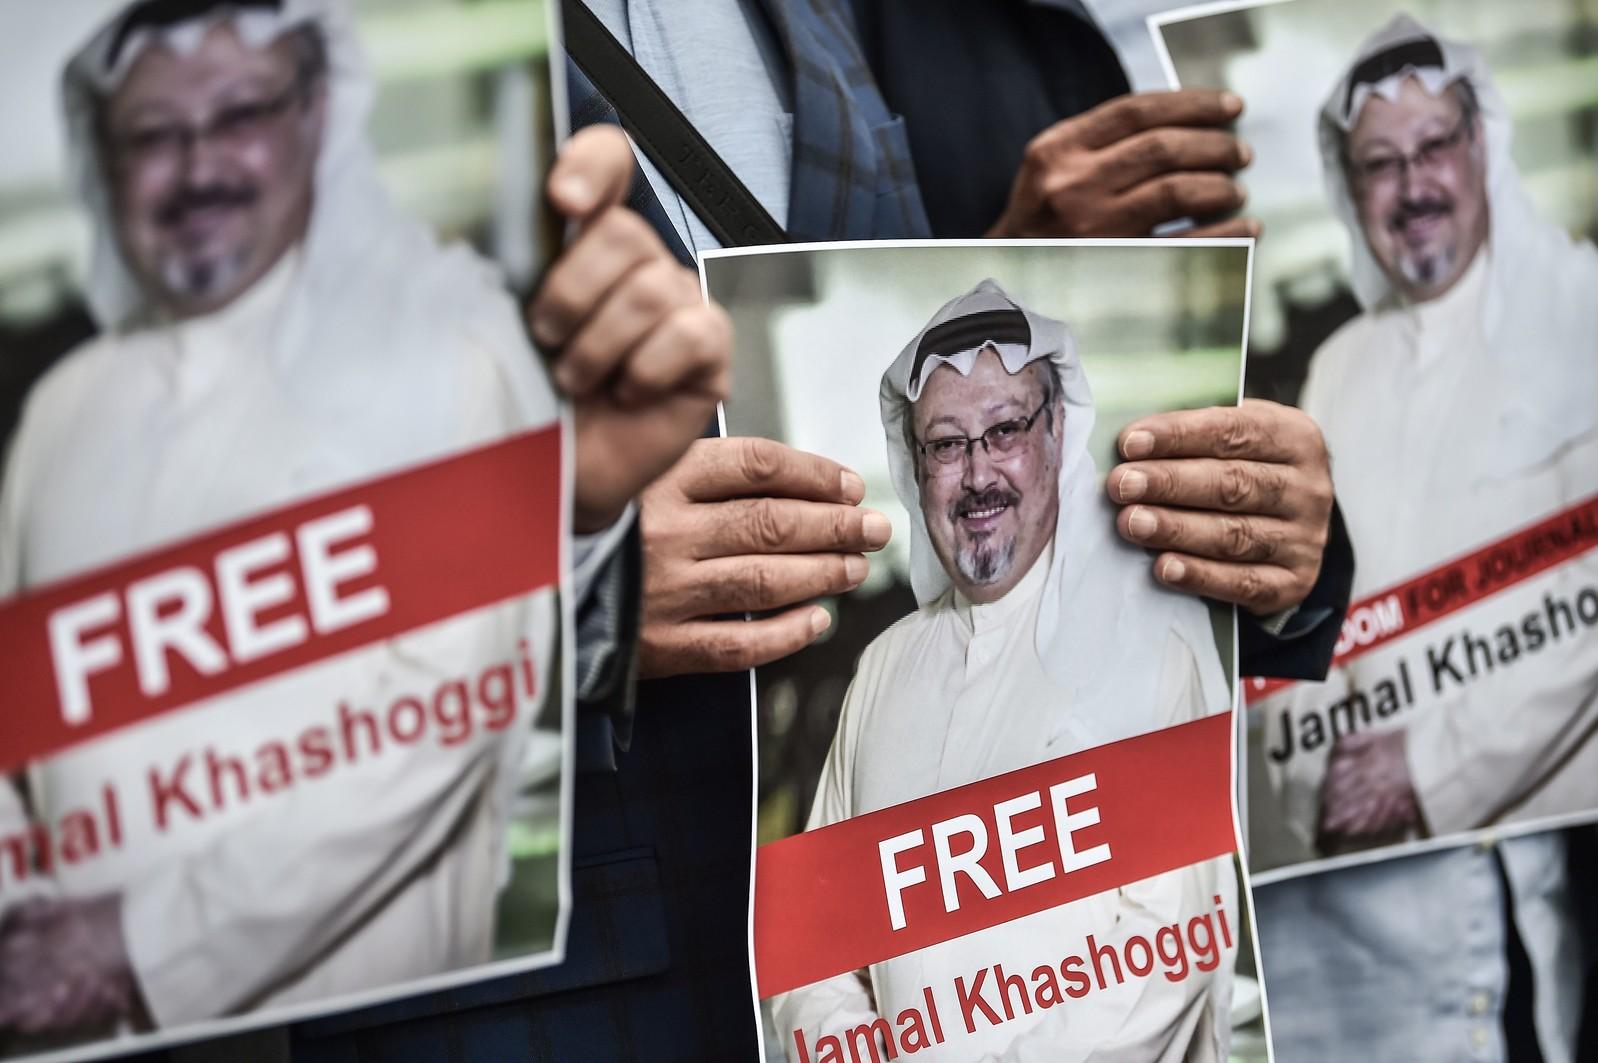 Turkey: Seek UN inquiry on possible extrajudicial execution of the Saudi journalist Khashoggi